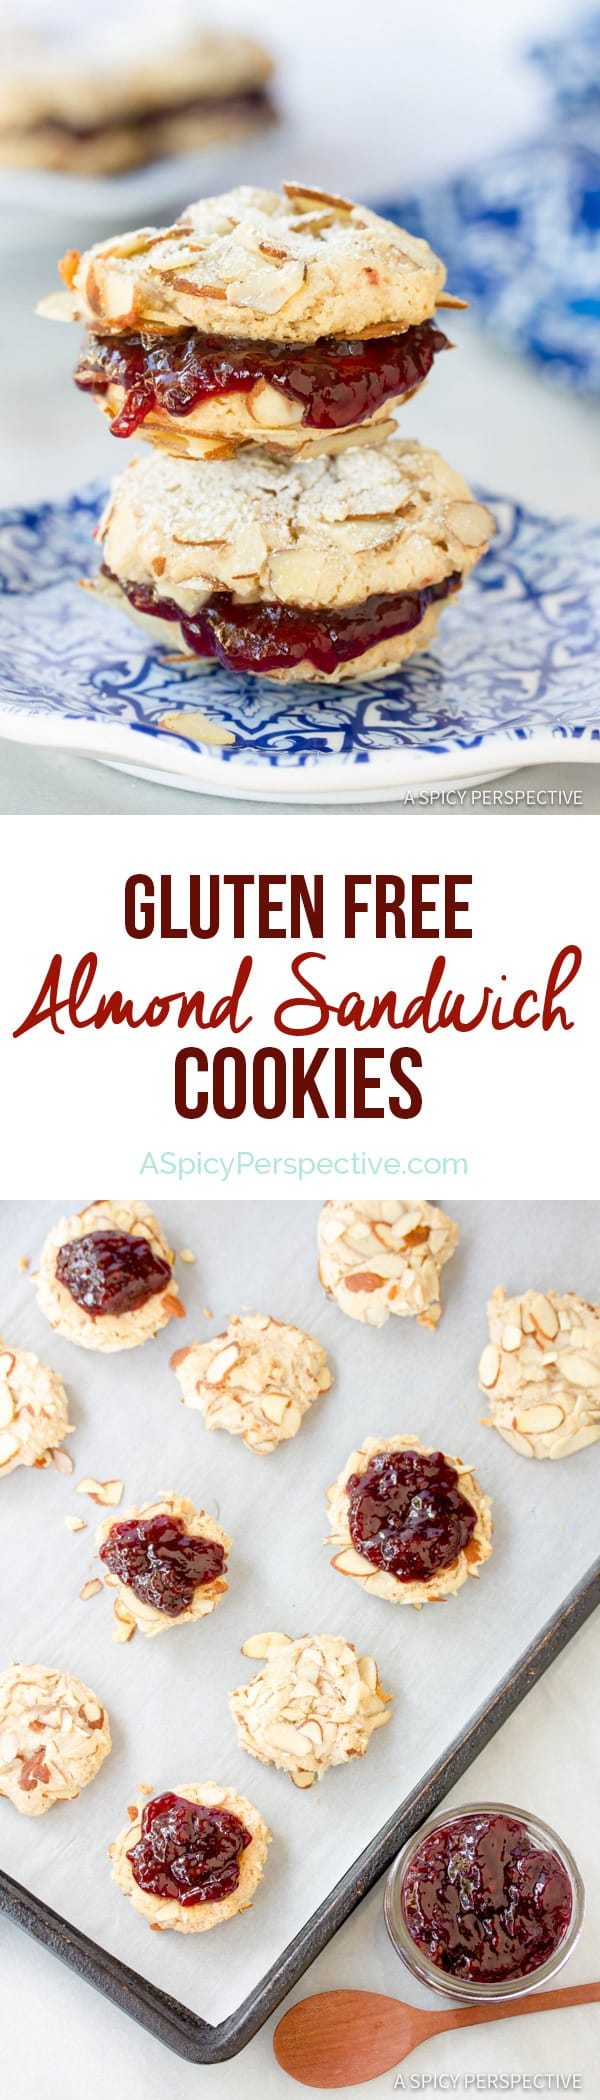 Amazing Gluten Free Almond Sandwich Cookies #christmas #holiday